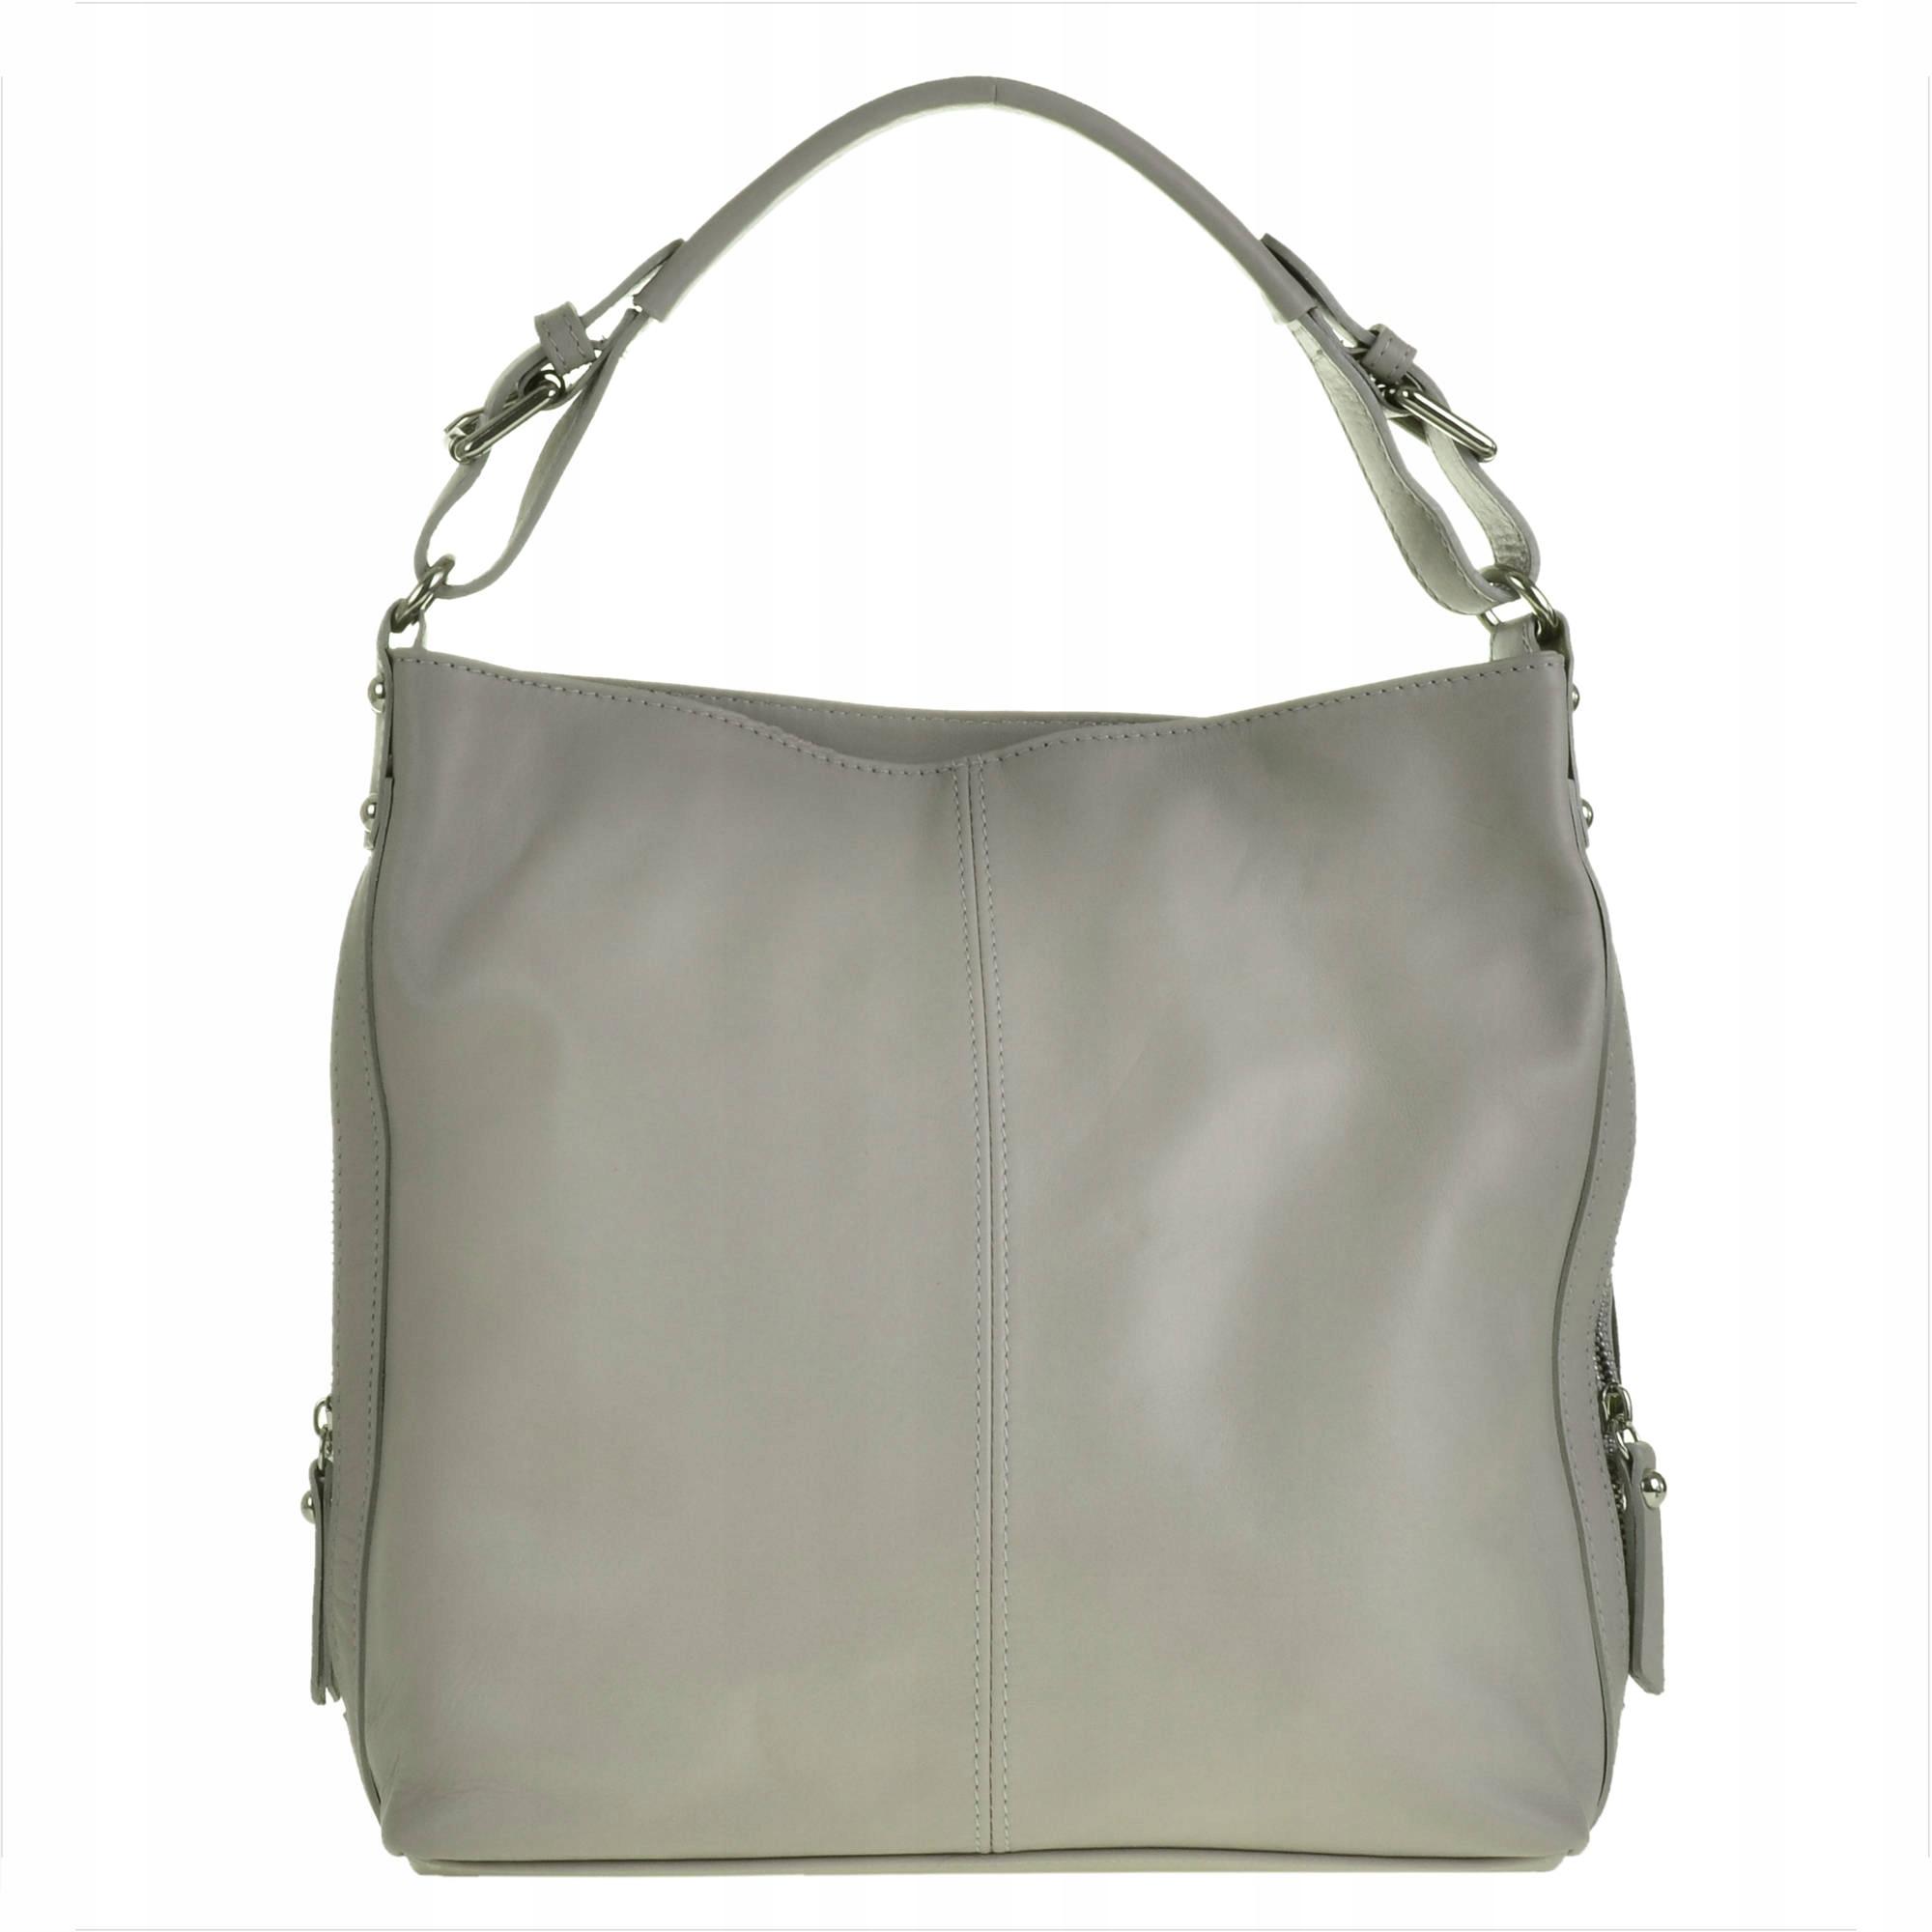 8544a3a757b38 Skórzana torba damska na ramię popielata shopper - 7227908056 ...